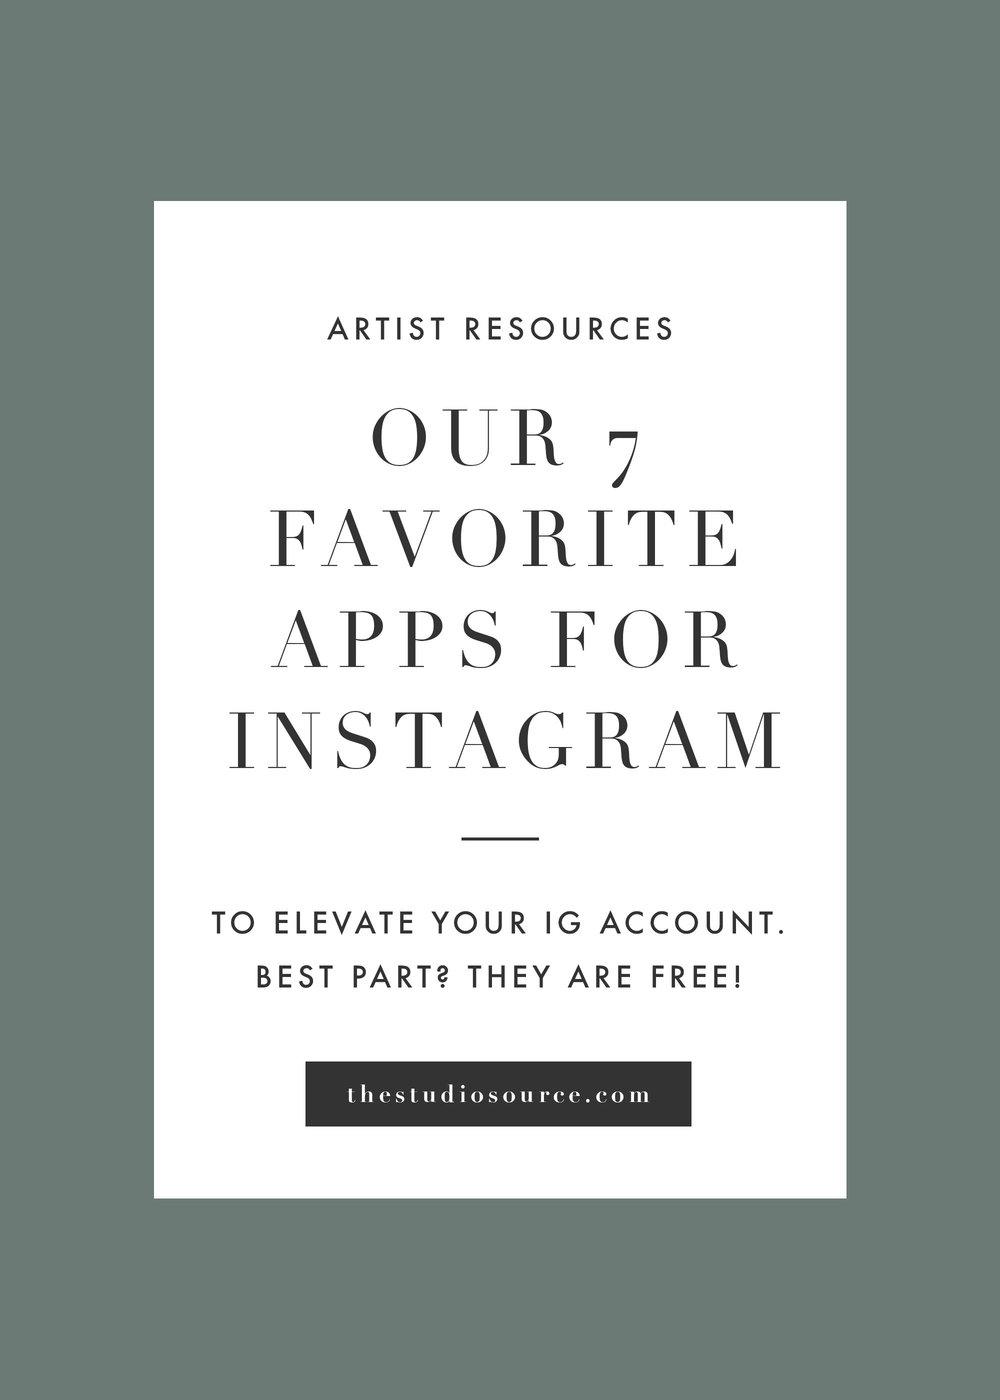 Top Instagram Apps for Artists.jpg